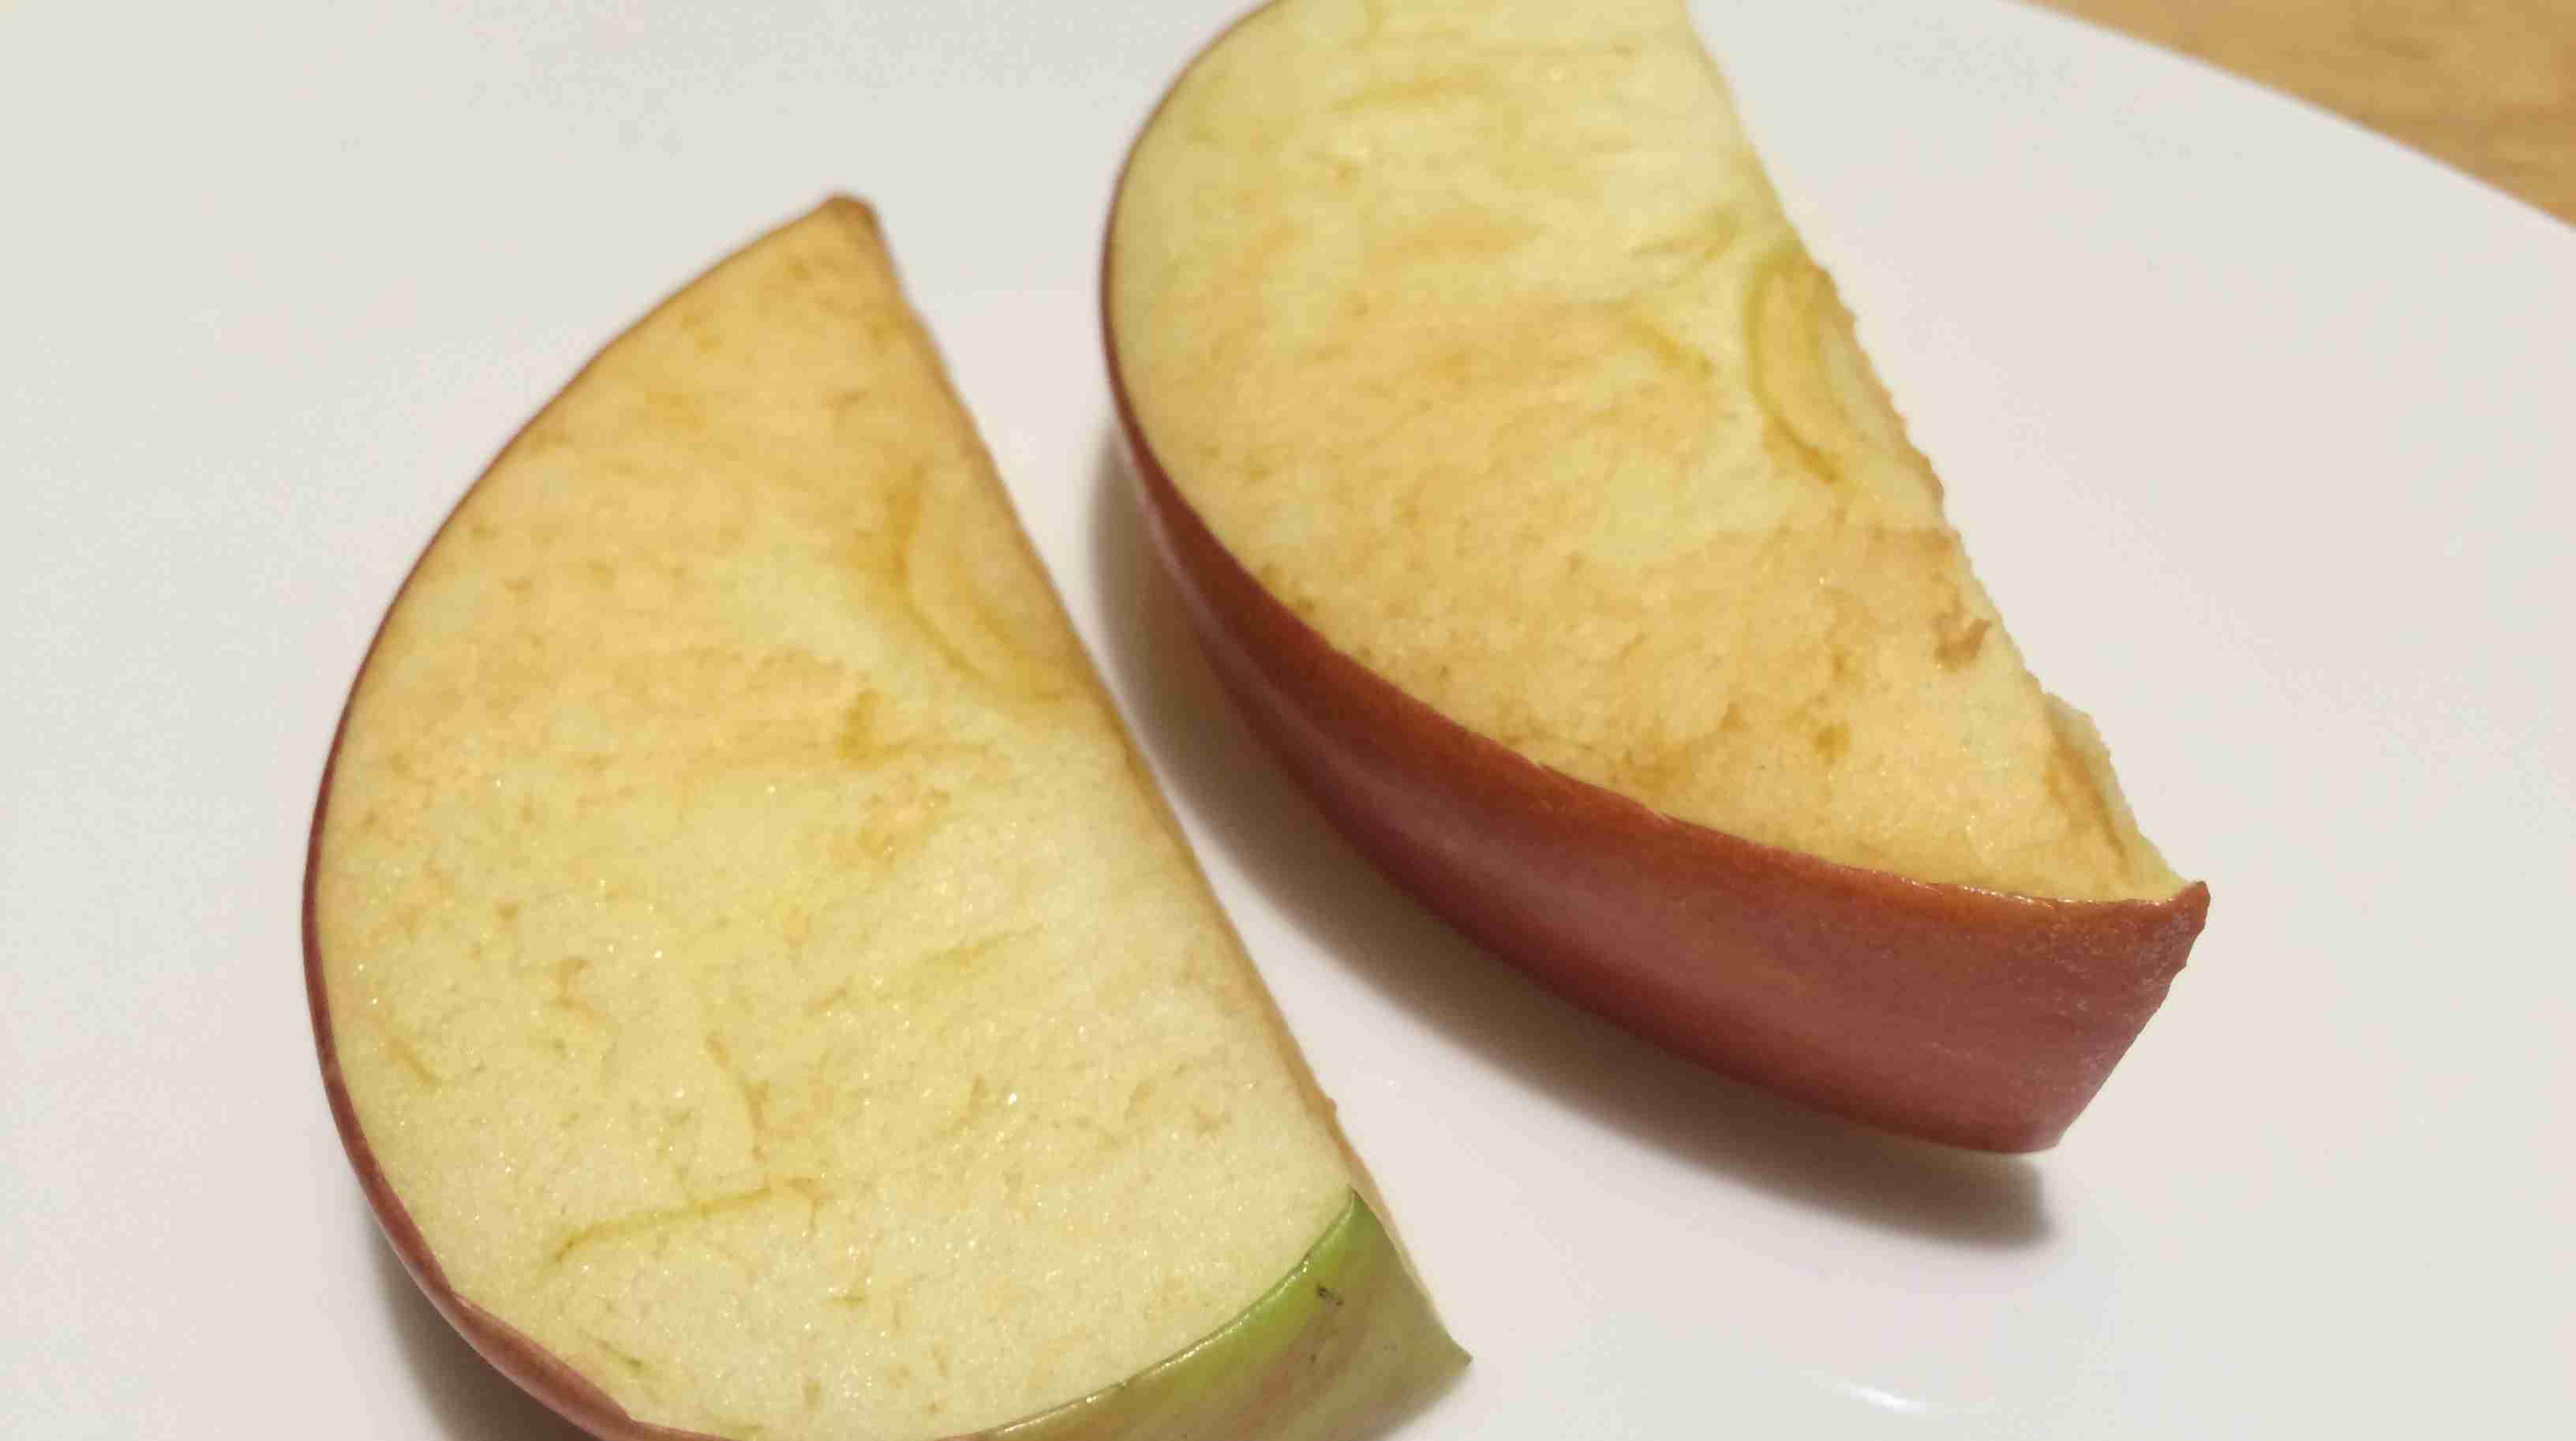 Apple Oxidation